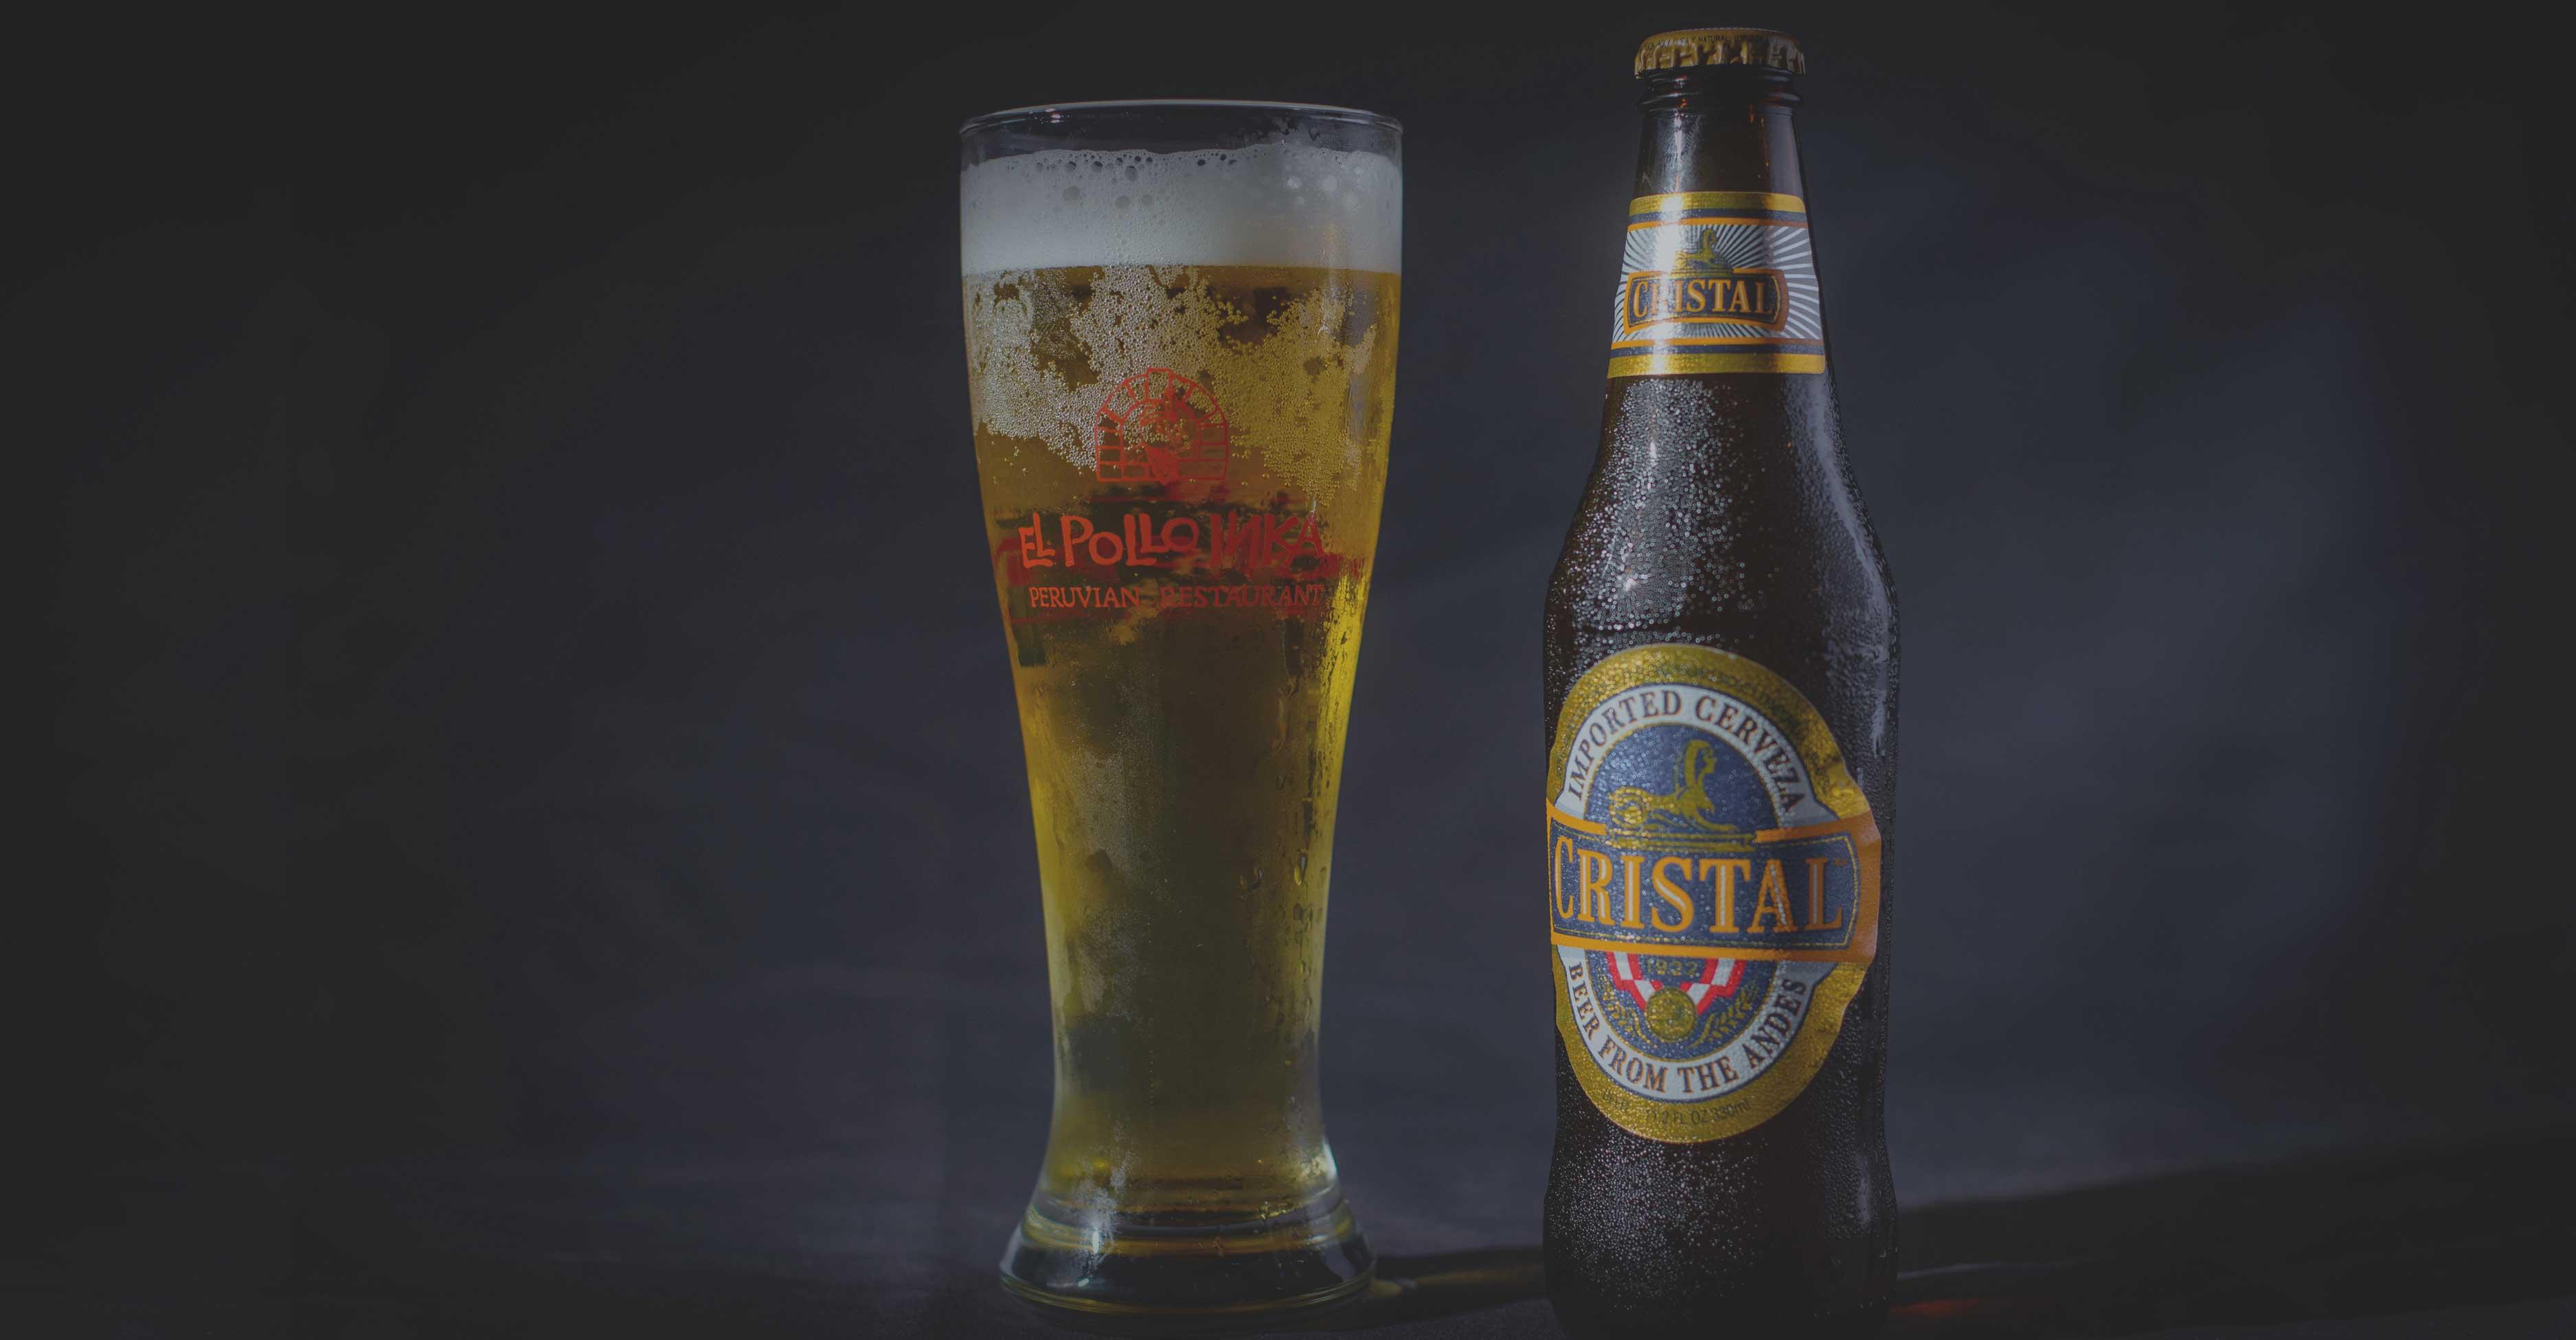 El Pollo Inka Glass and Cristal Beer